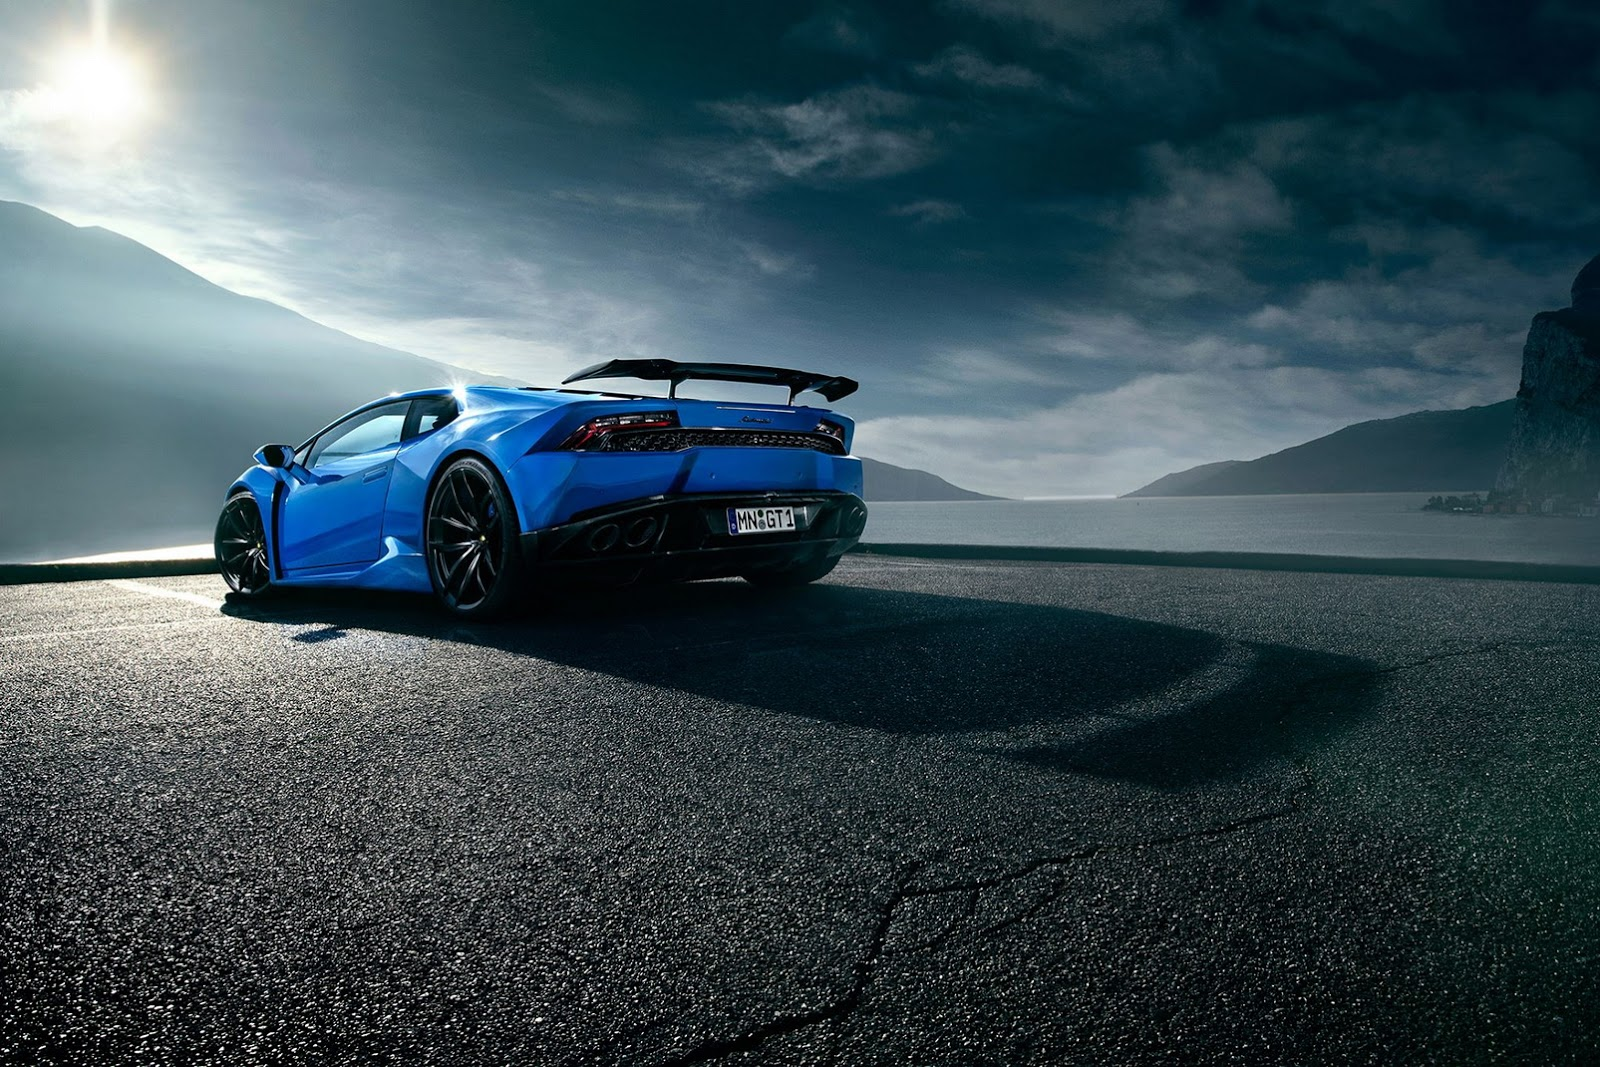 Novitec Torado Lamborghini Huracan N-Largo: 860 CV y una estética muy bruta 2